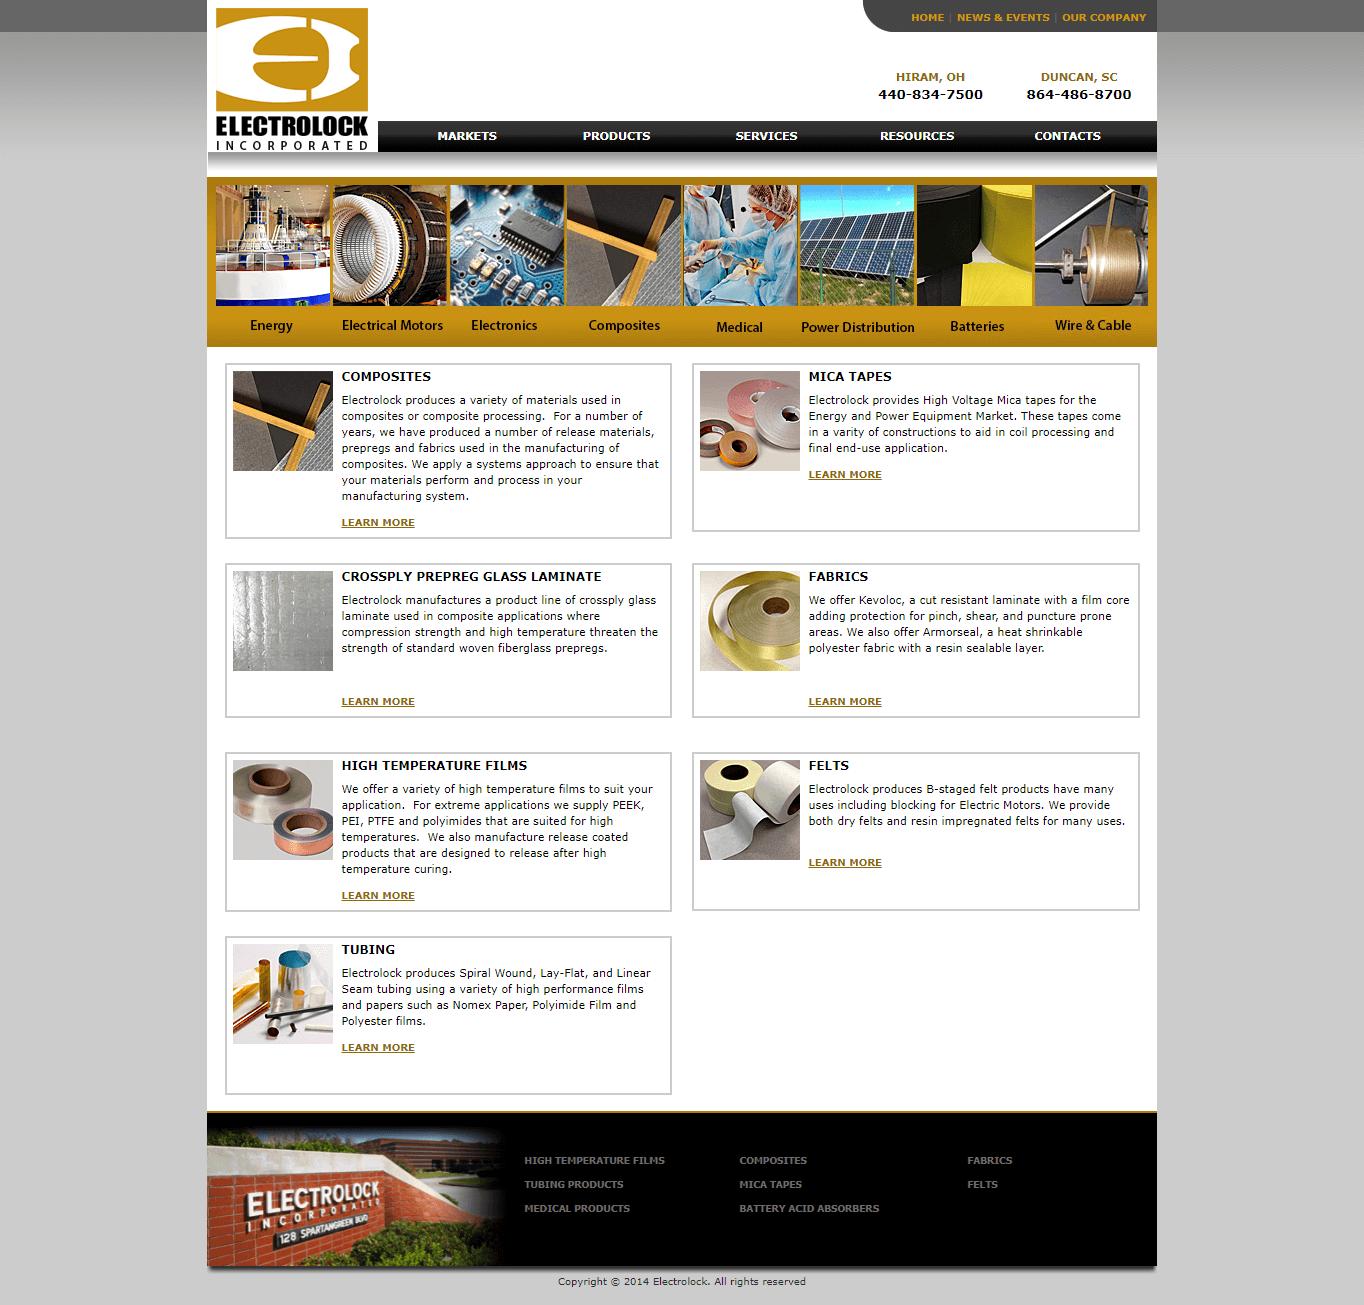 Electrolock homepage before the website redesign